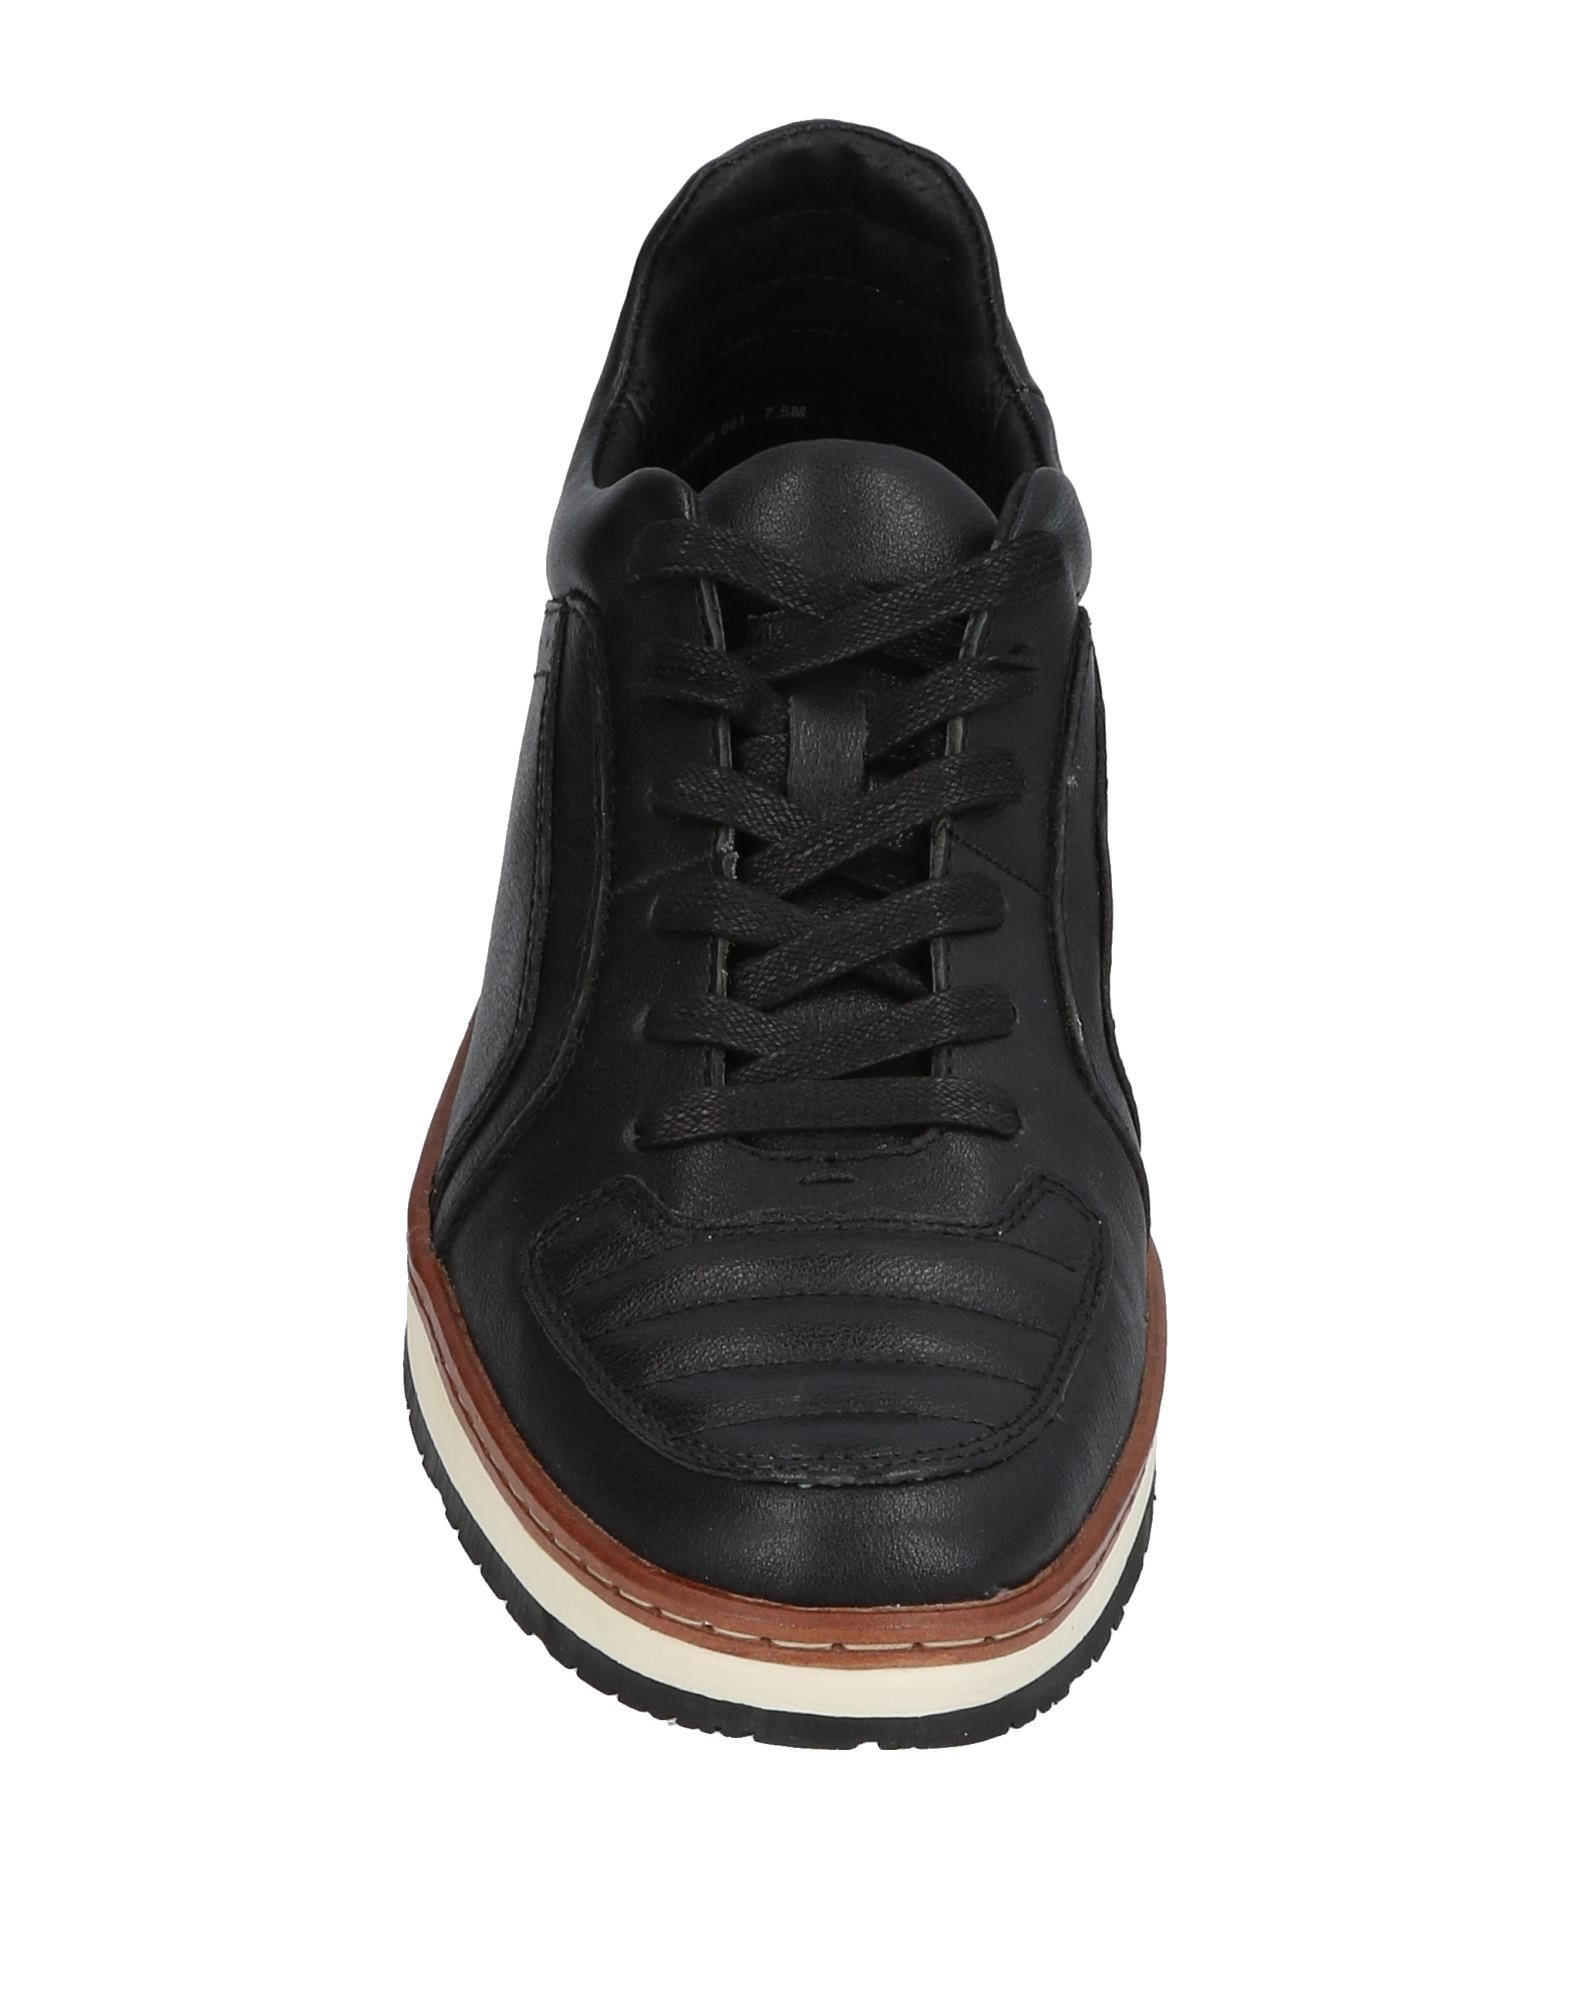 John Varvatos ★ 11440179XS U.S.A. Sneakers Herren  11440179XS ★ 419e94